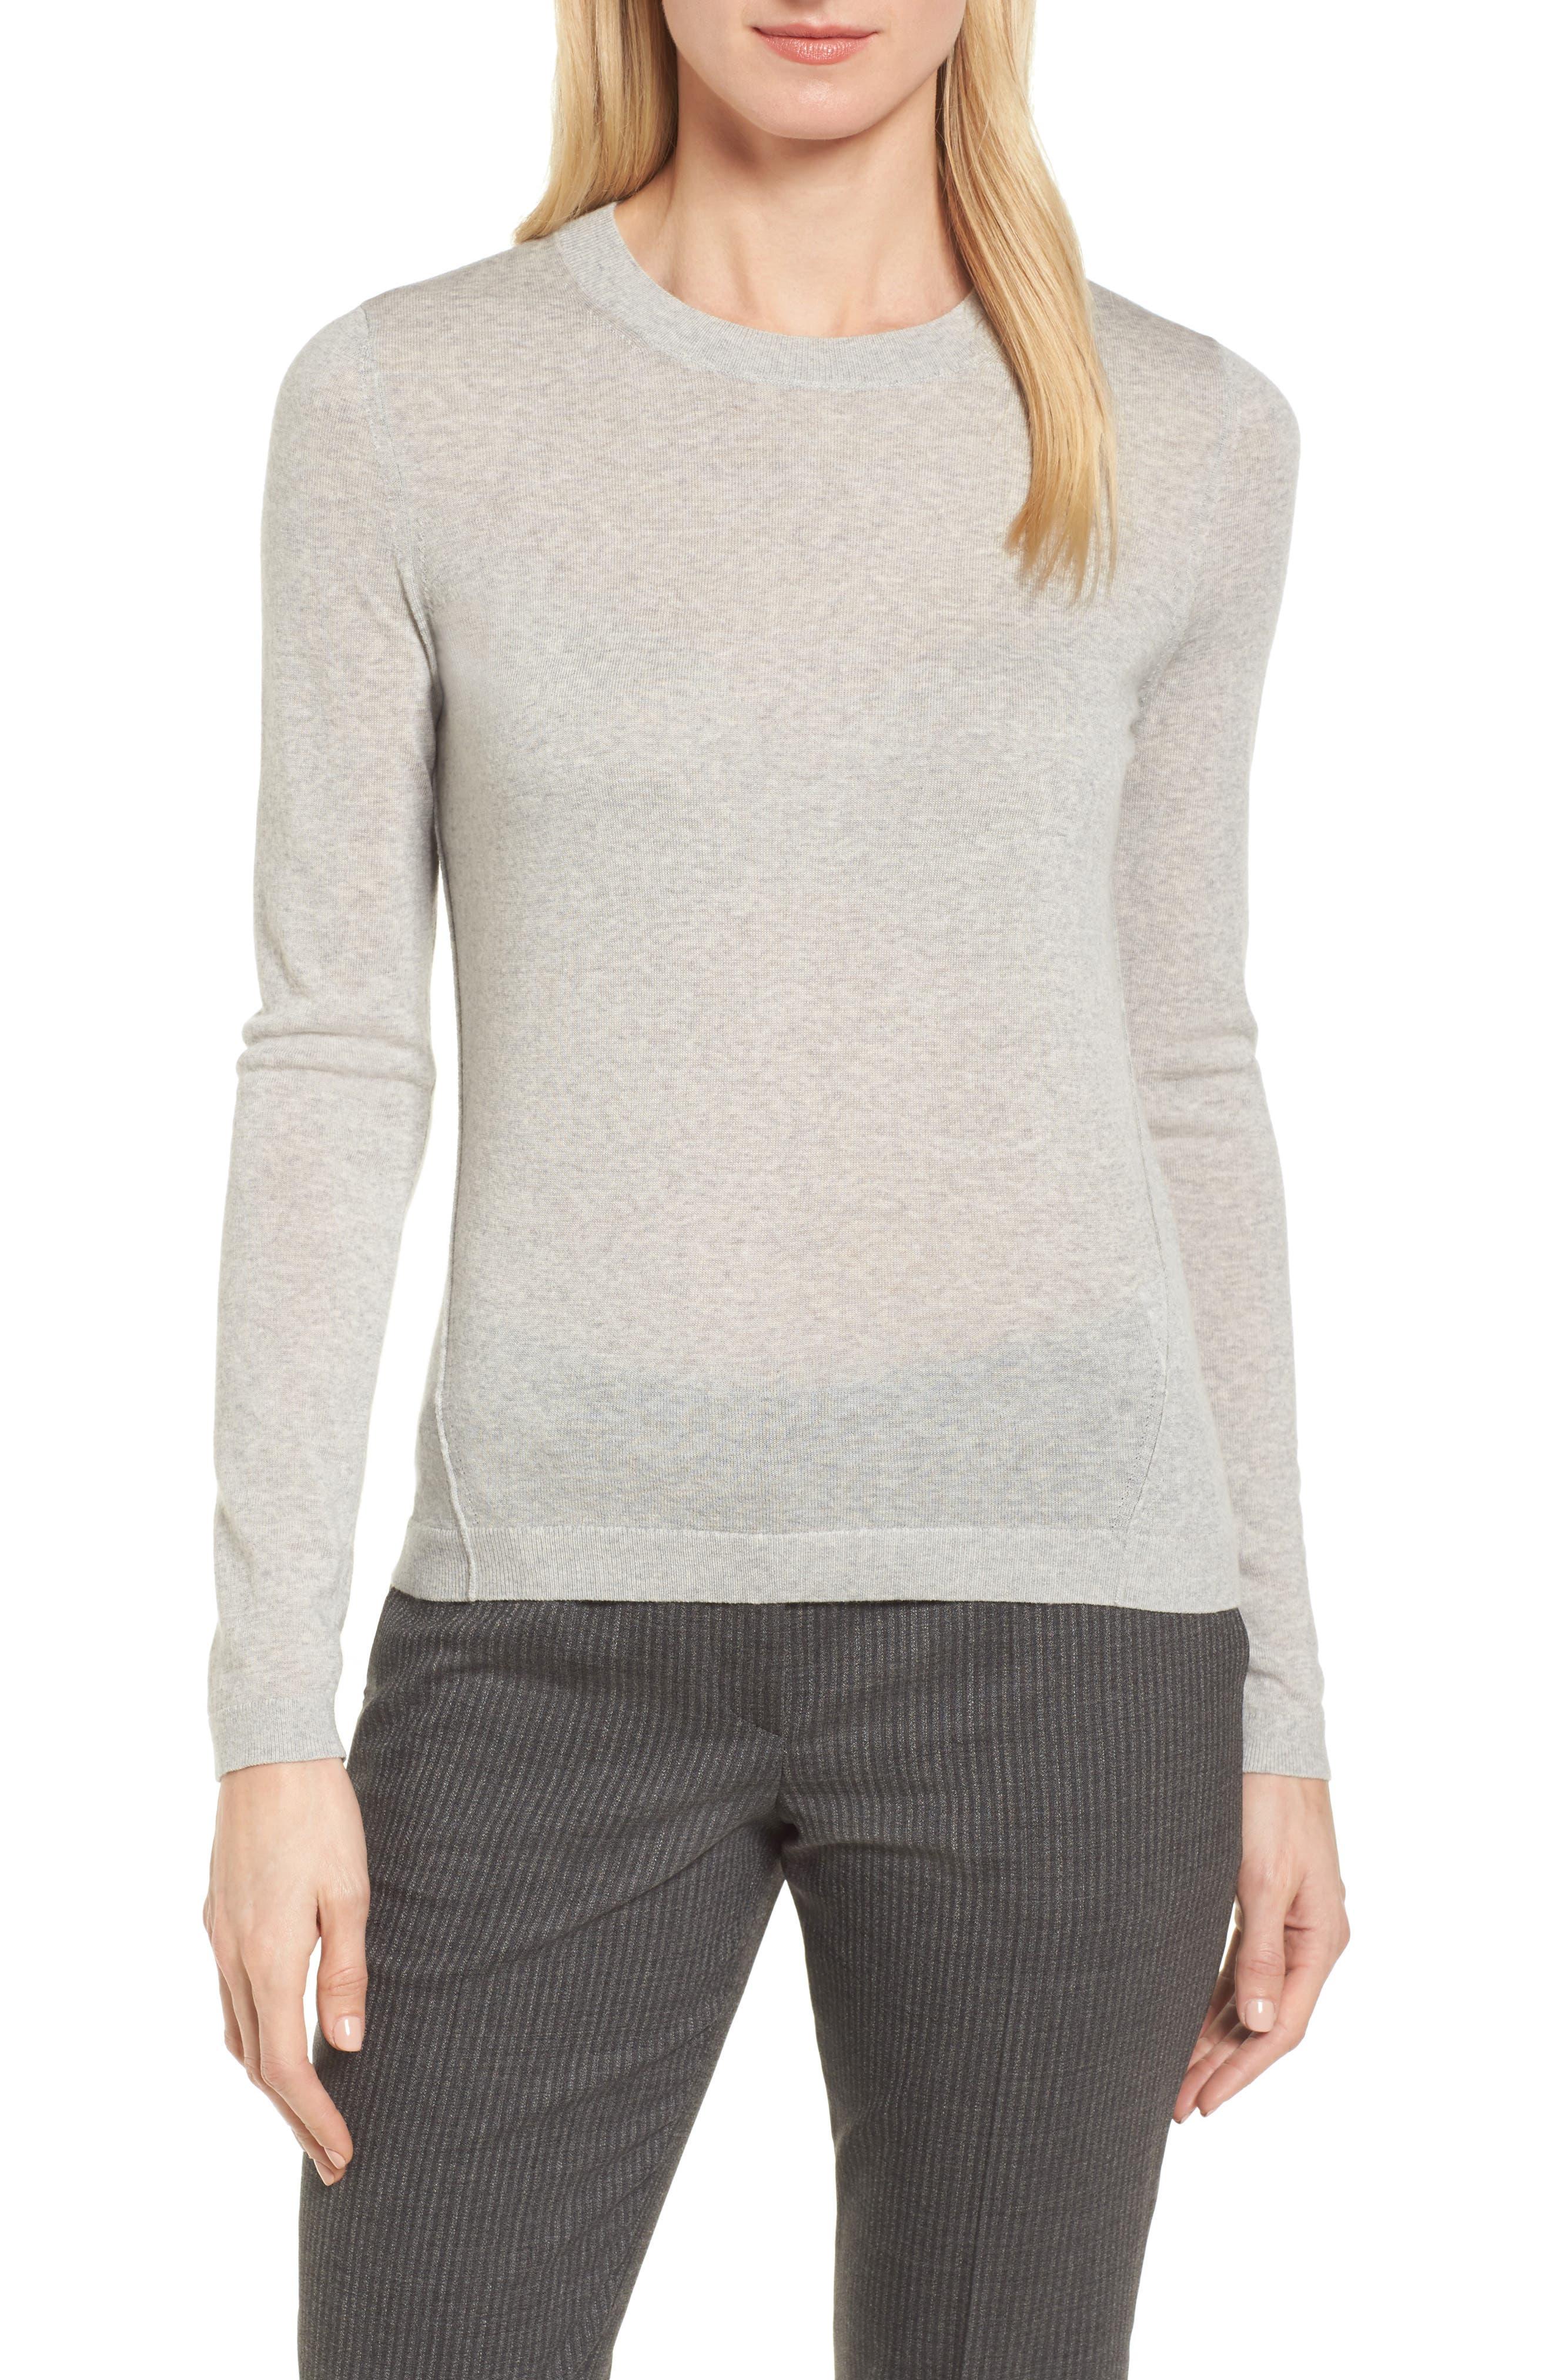 Fayme Wool Crewneck Sweater,                             Main thumbnail 1, color,                             Cozy Grey Melange